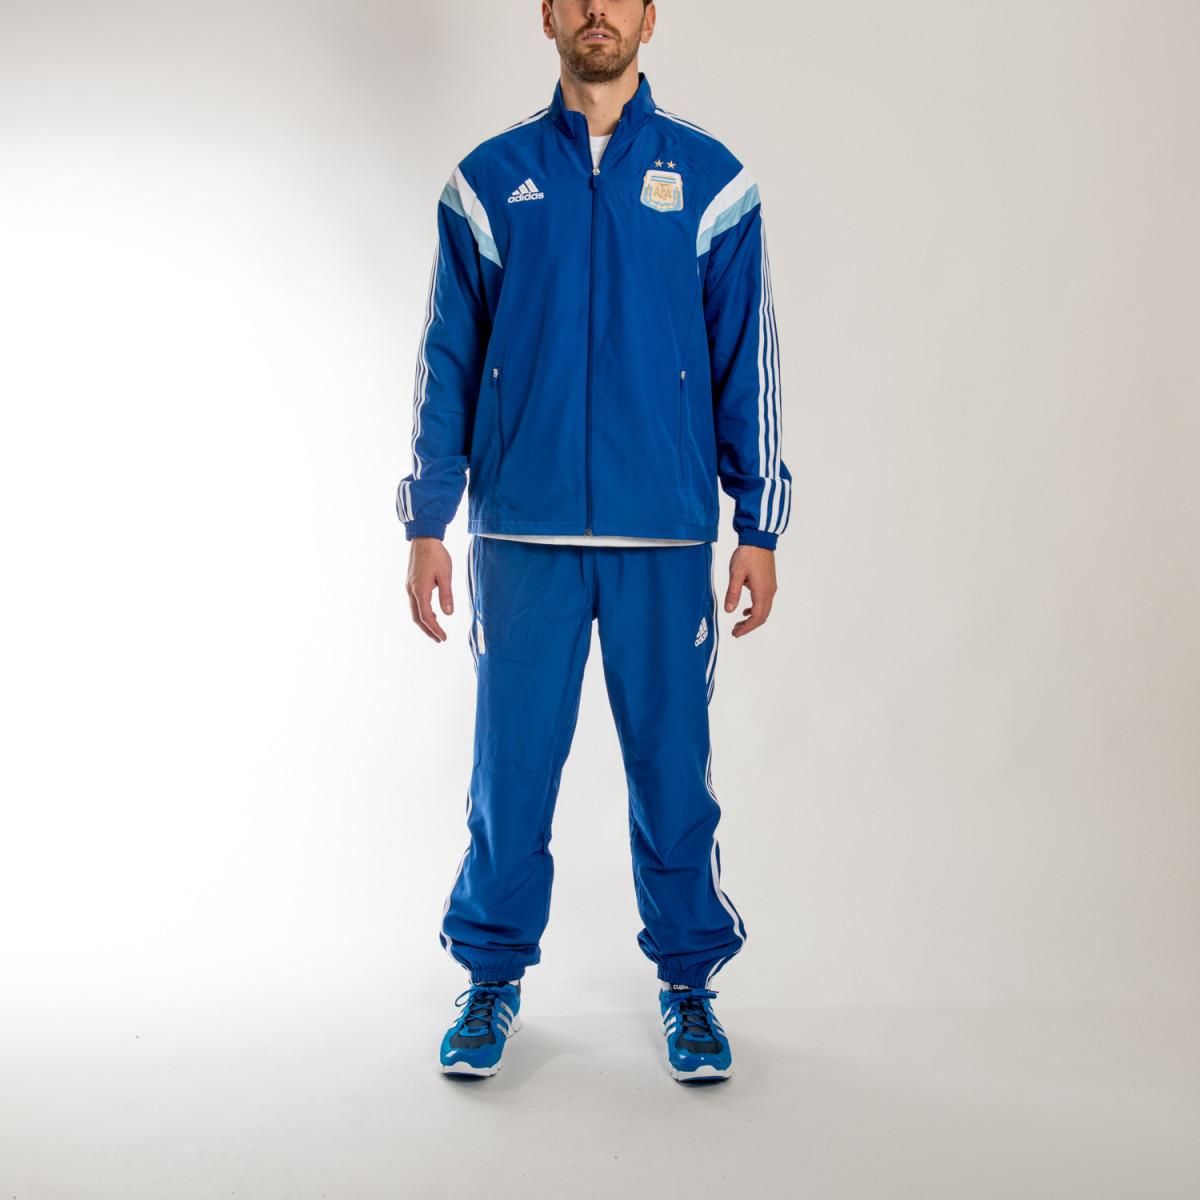 d054246e1 Conjunto Adidas Argentina Pres Suit